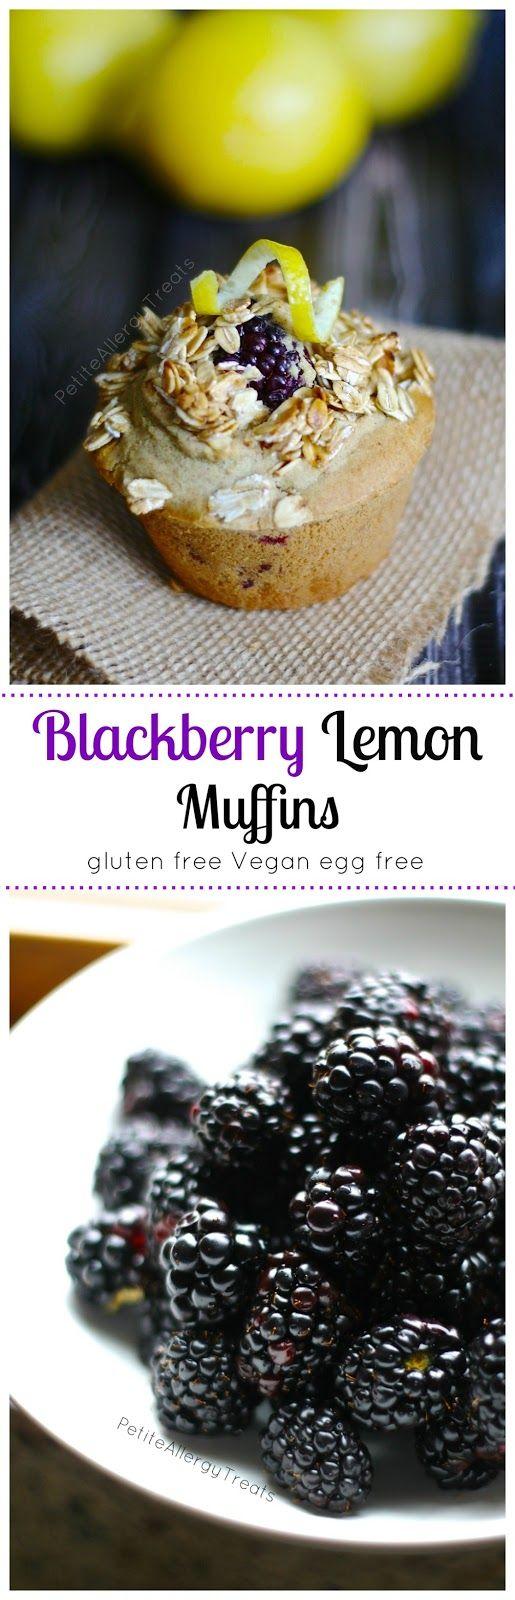 Lemon Blackberry Muffins (Gluten free Vegan) Luscious blackberries with hints of lemon, best gluten free muffin EVER!